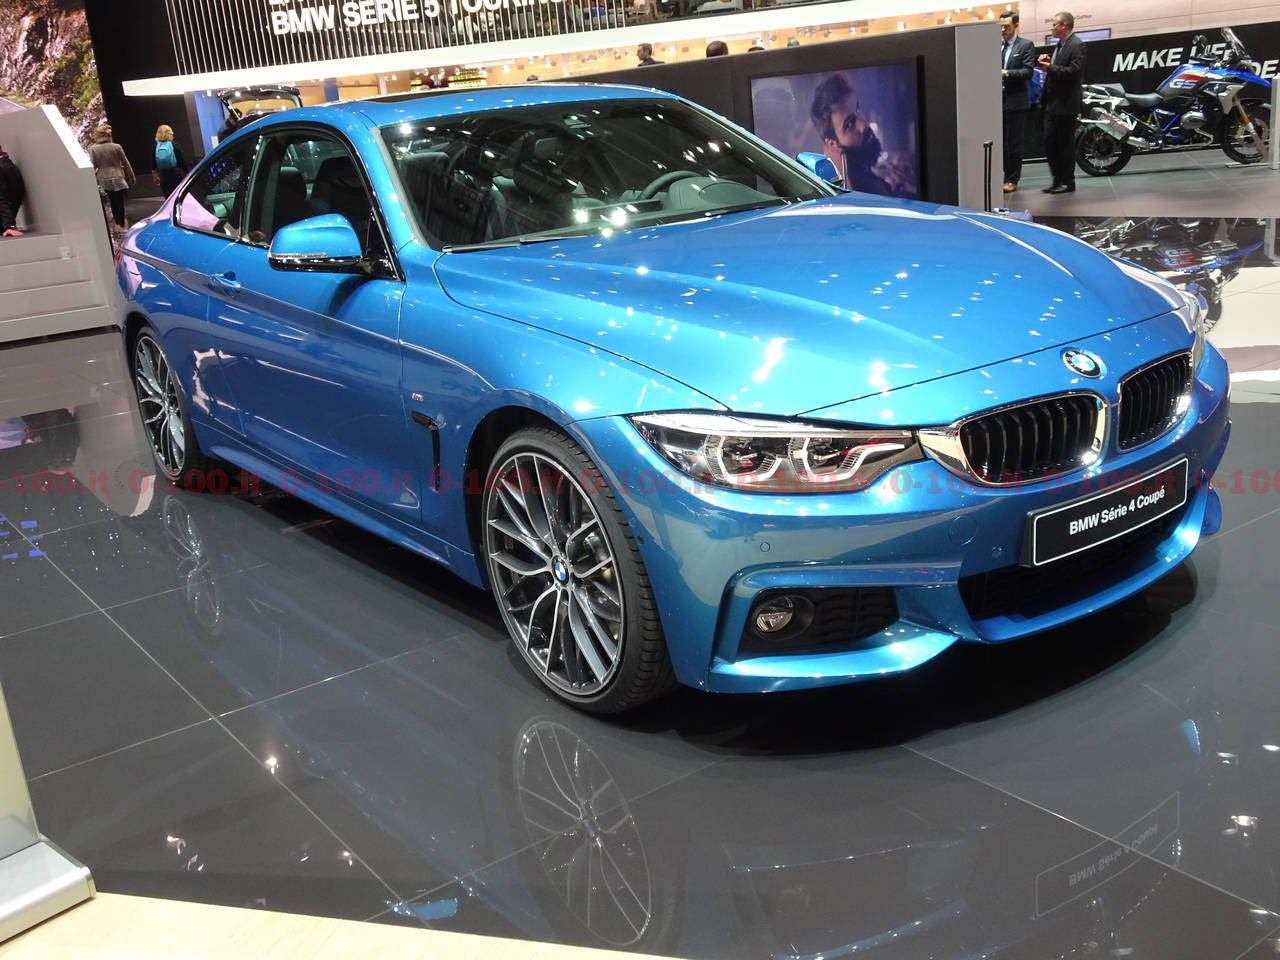 Ginevra-geneva-geneve-2017-BMW_Serie-4_0-100_6